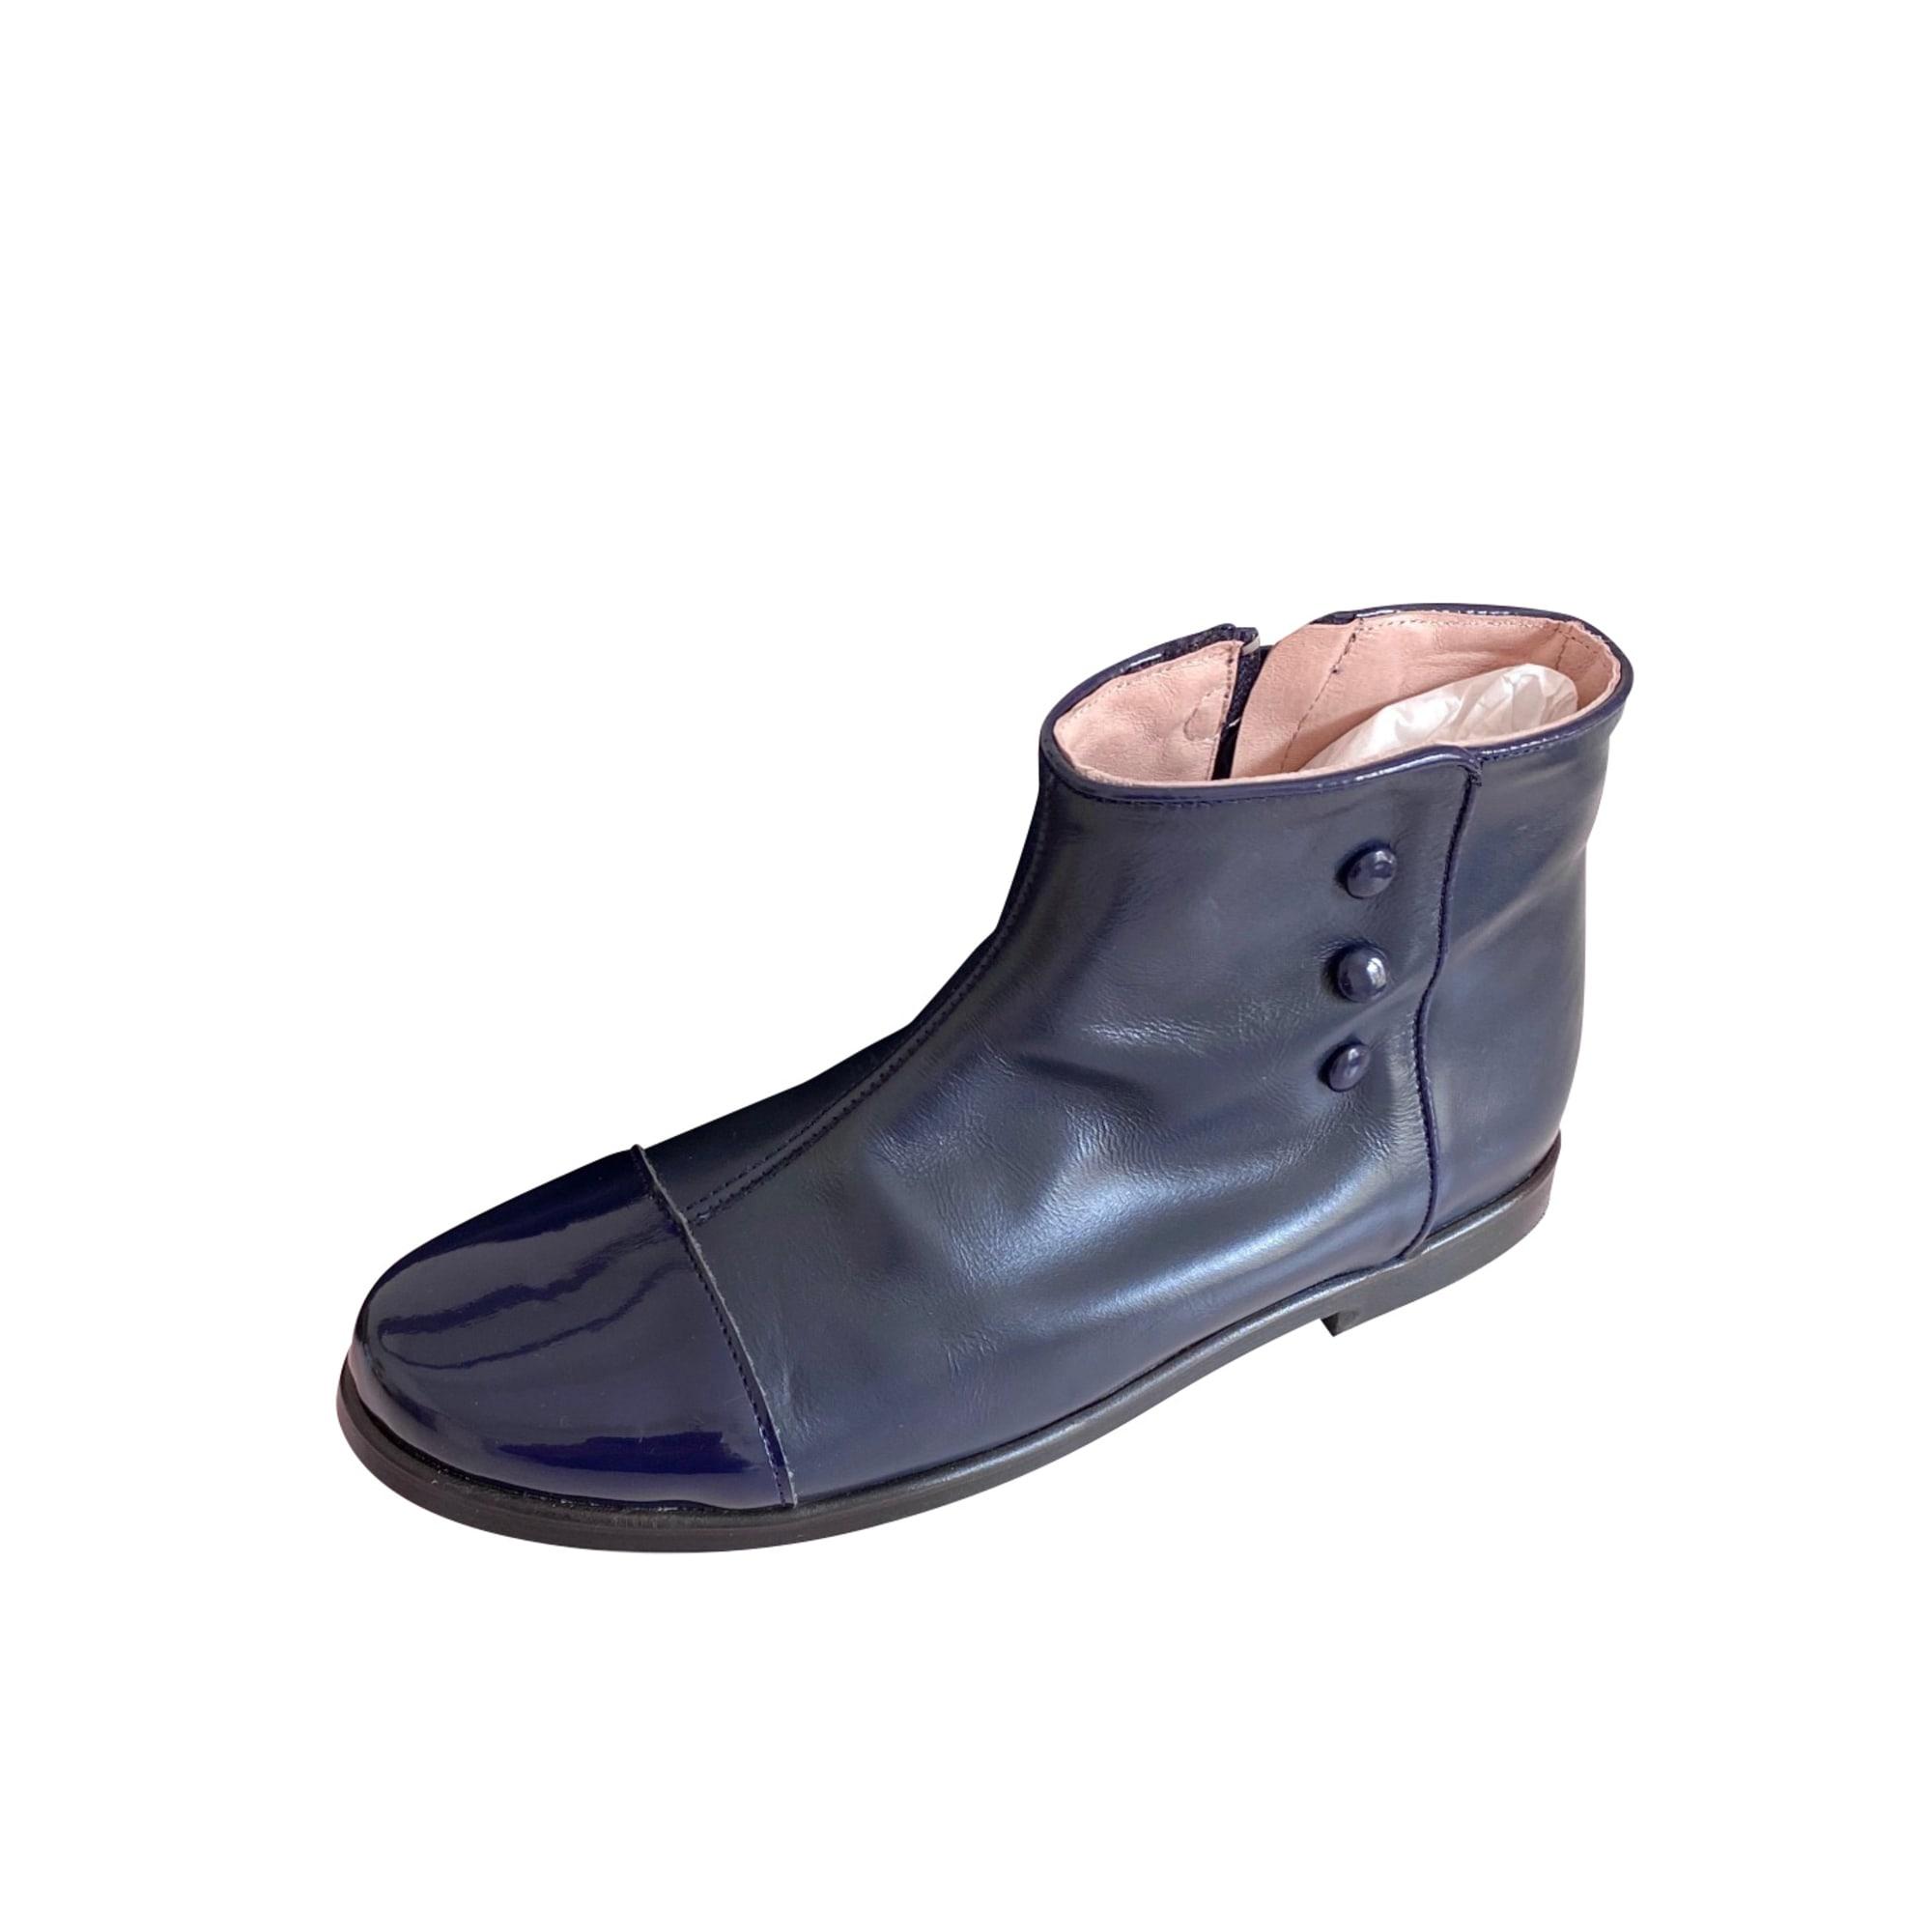 Bottines JACADI Bleu, bleu marine, bleu turquoise